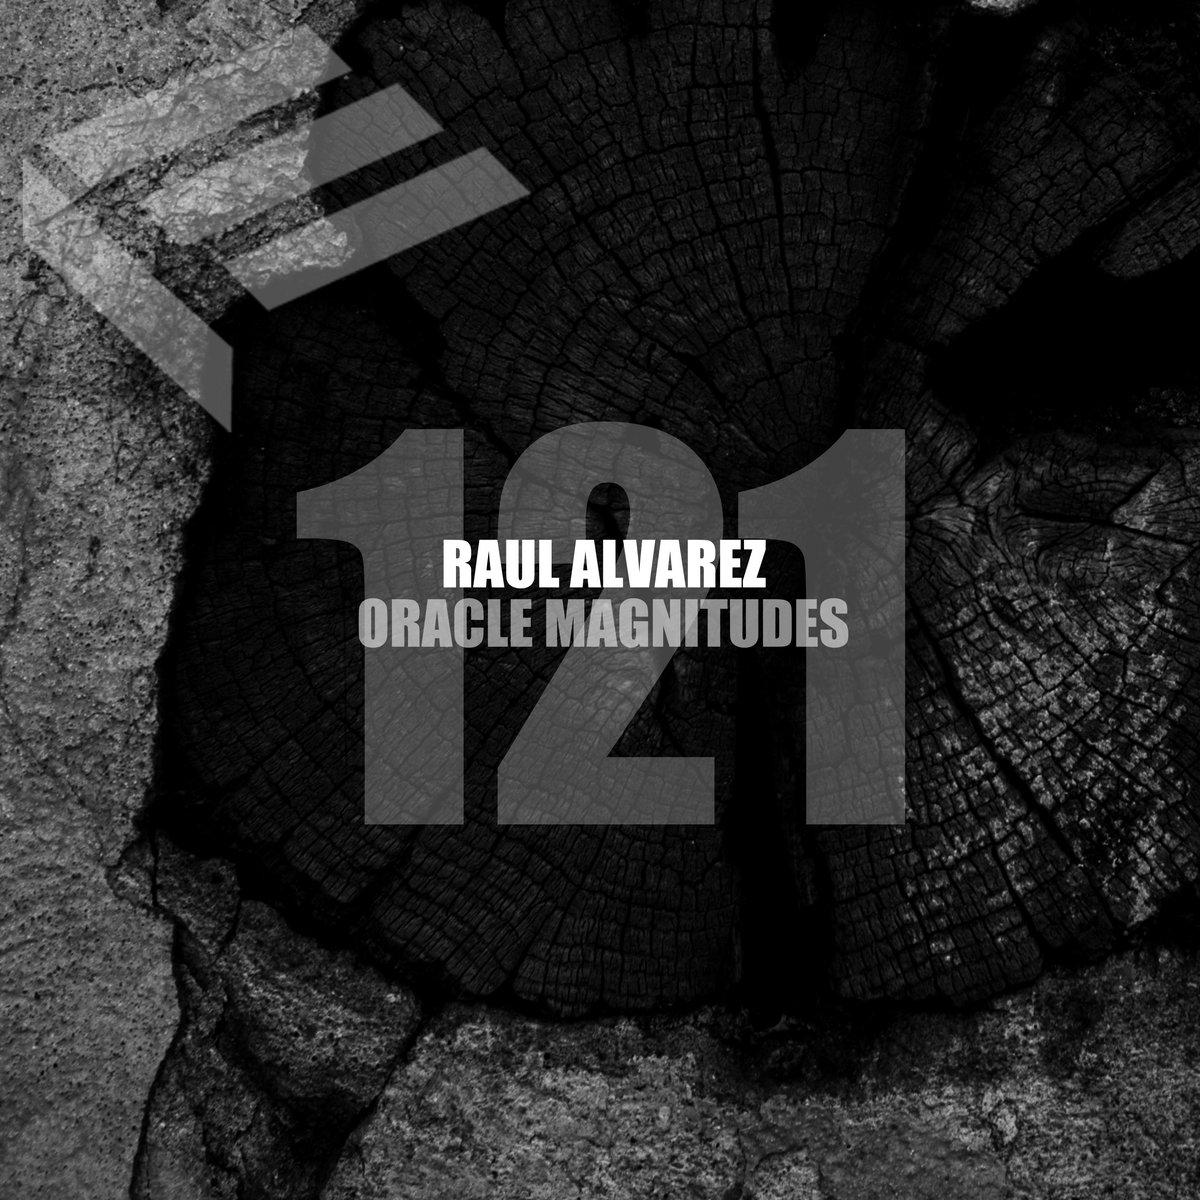 Raul Alvarez - Oracle Magnitudes (2019) [FLAC] Download